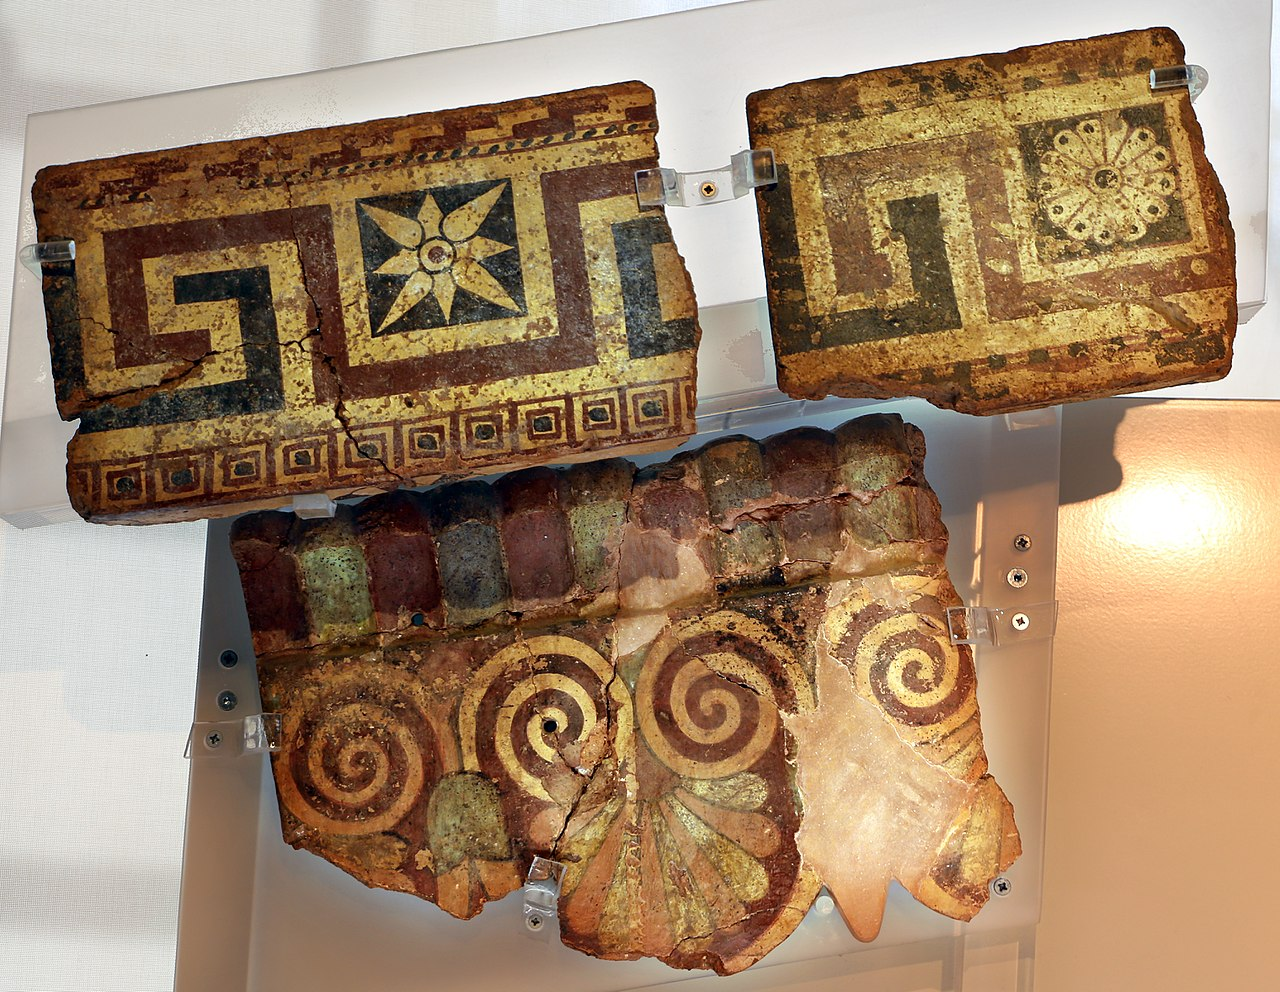 Pyrgi, santuario in loc. vigna parrocchiale, lastre dipinte, 530-520 ac ca. 01.jpg